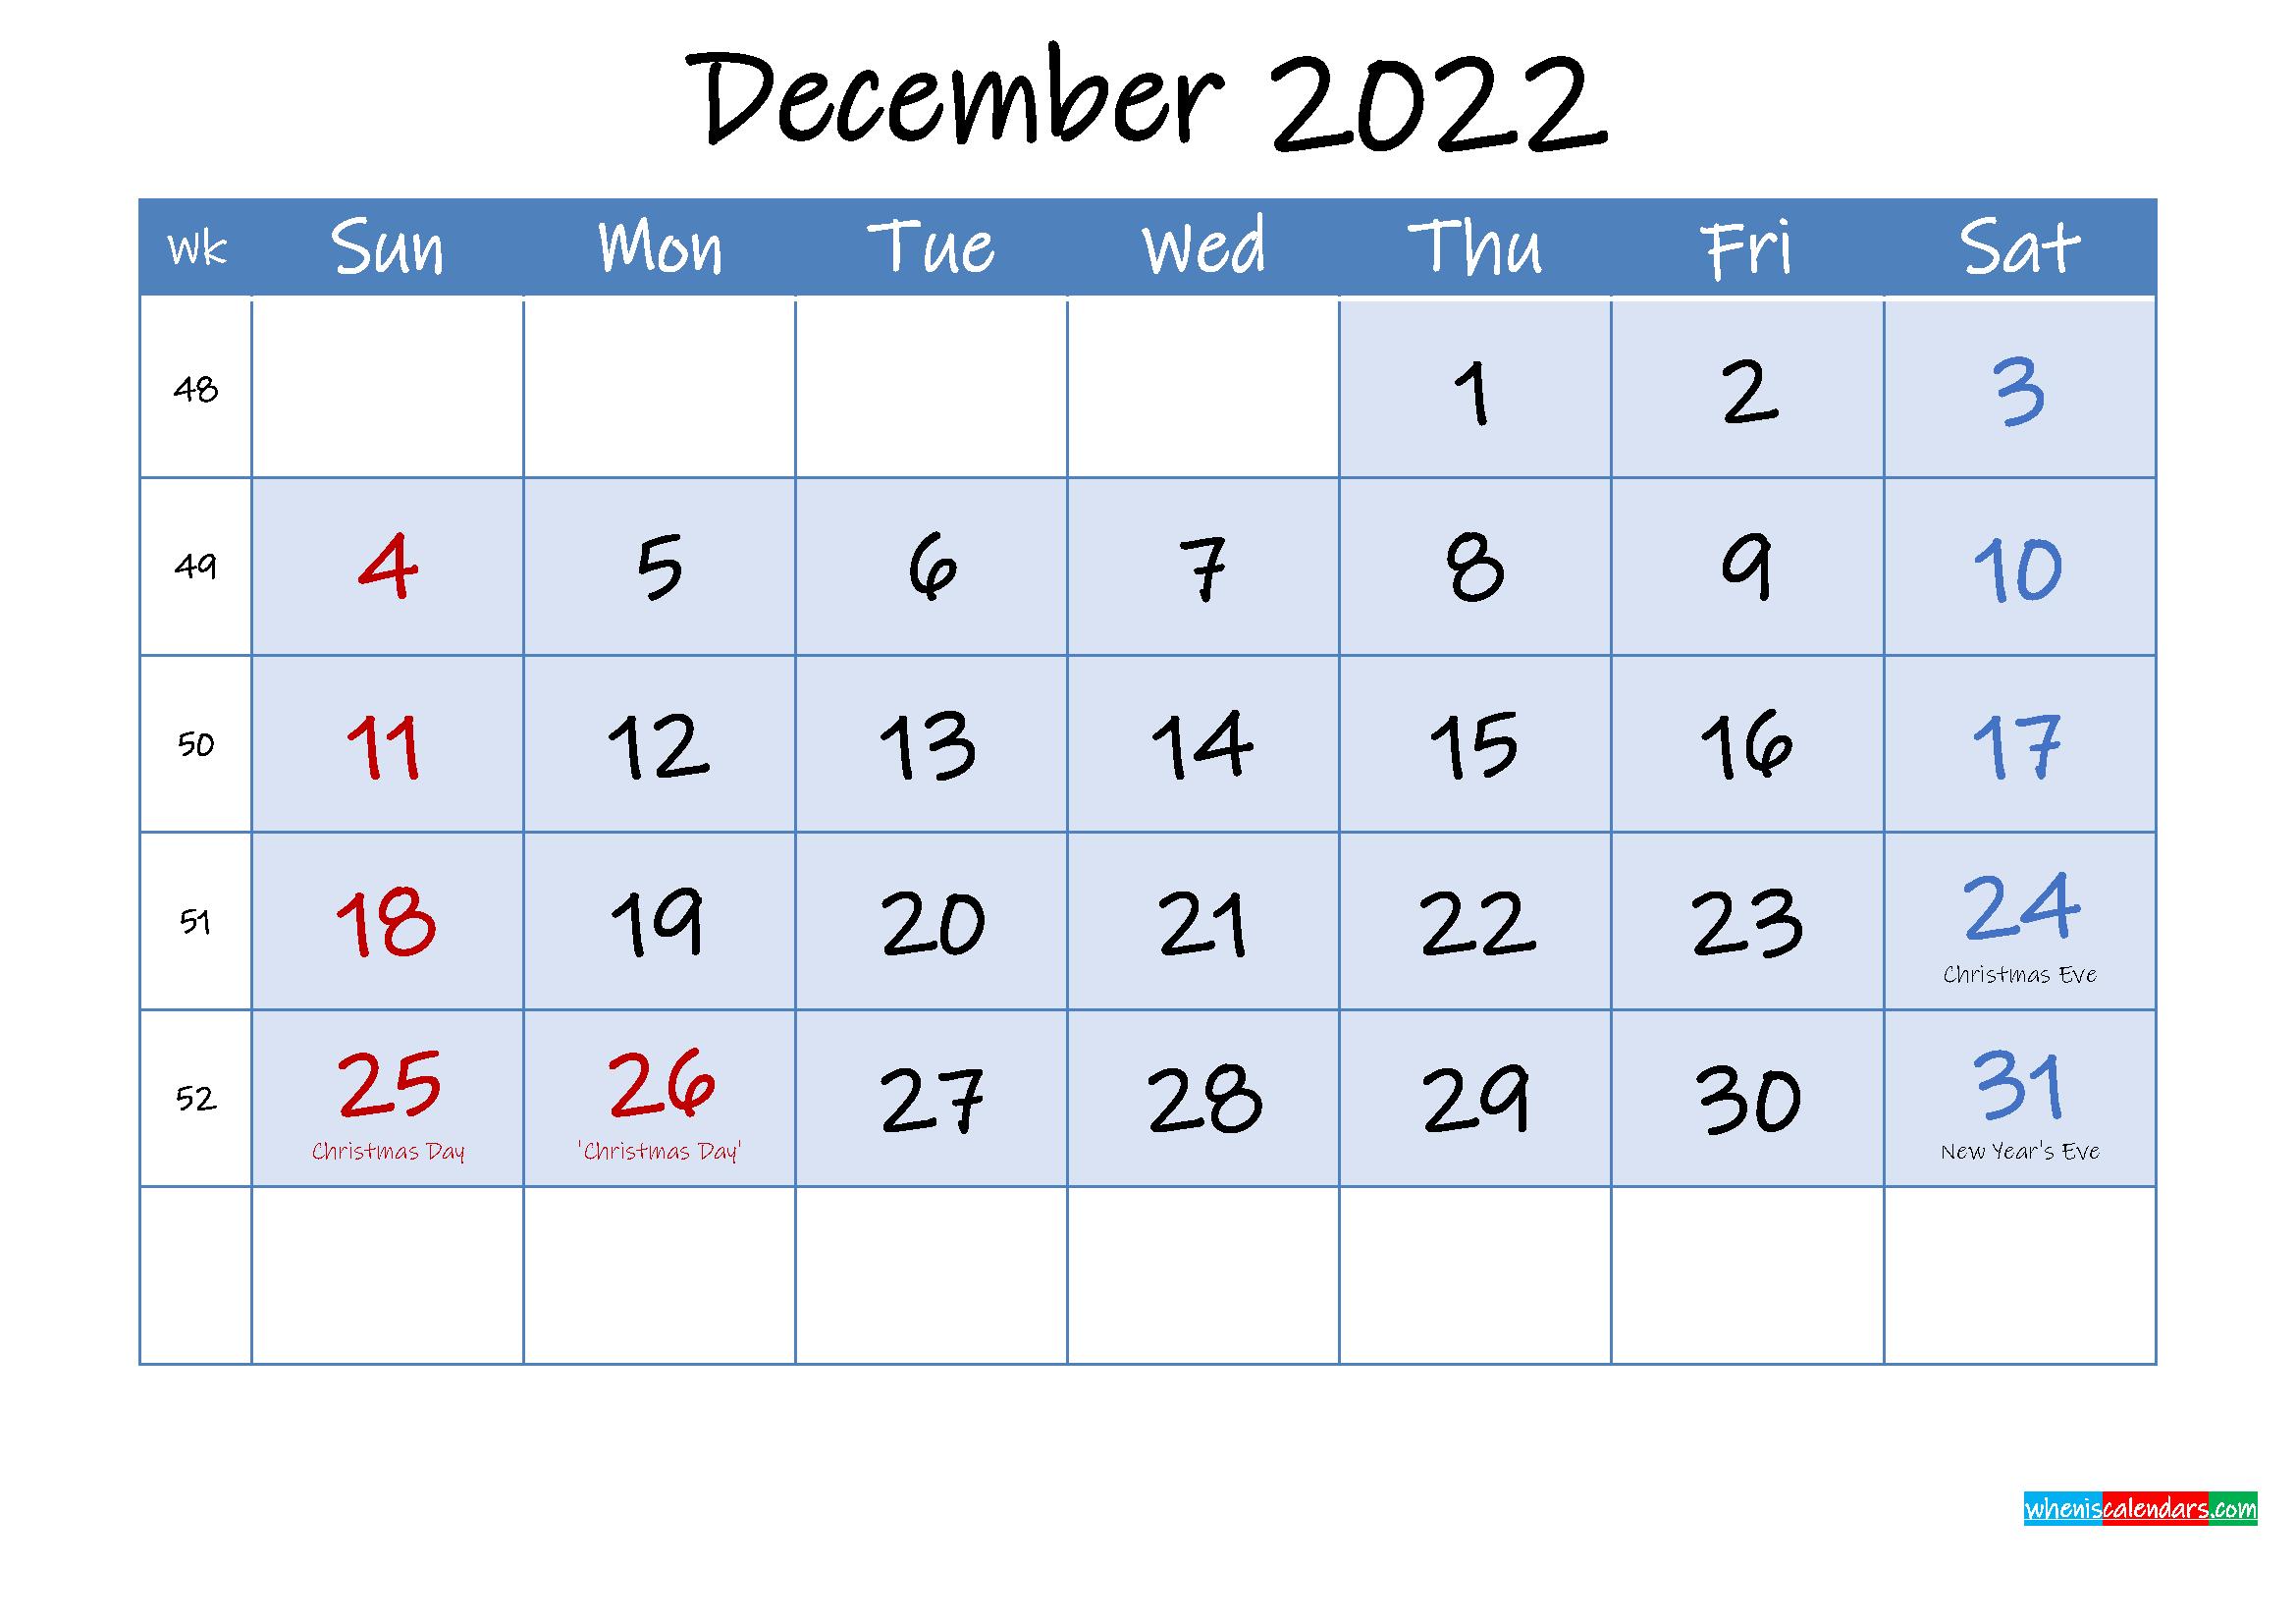 Printable December 2022 Calendar Word.Free Printable December 2022 Calendar Template Ink22m108 Free Printable 2021 Monthly Calendar With Holidays